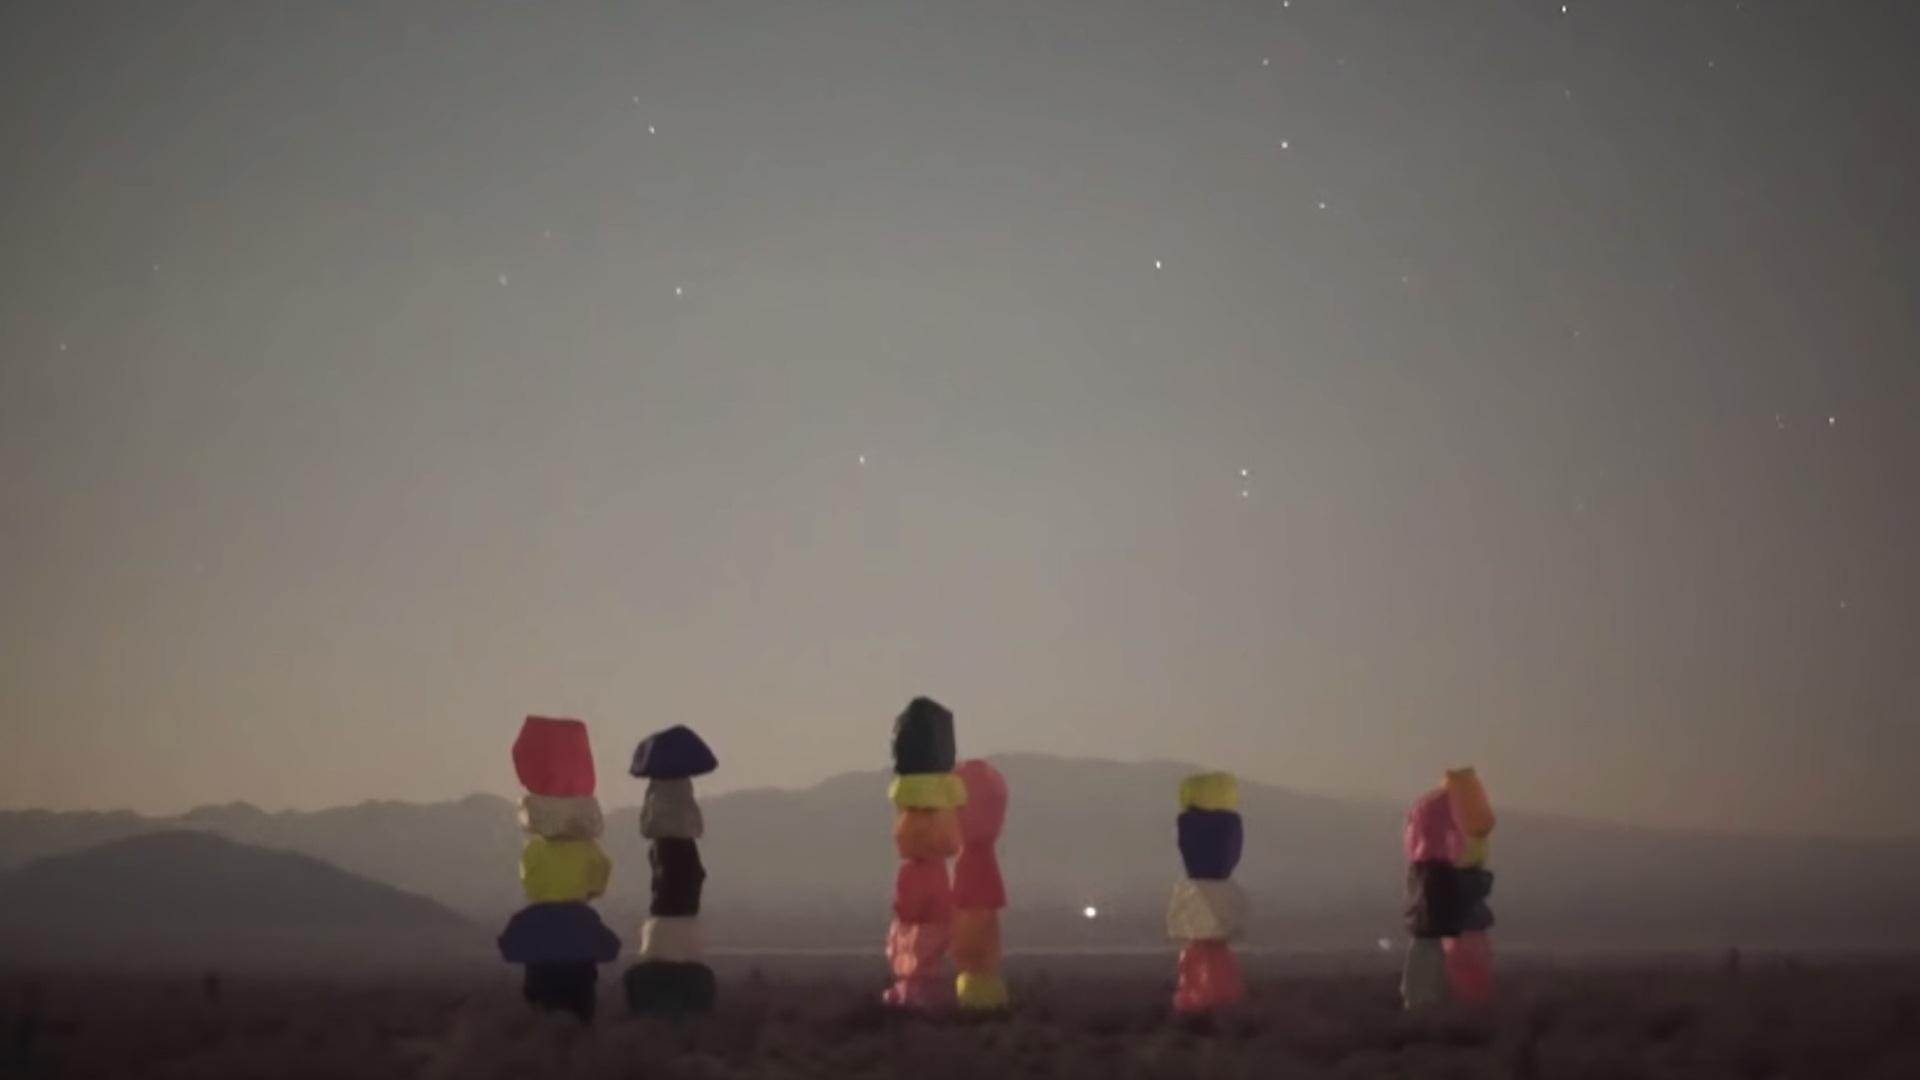 Color night vision taken at midnight